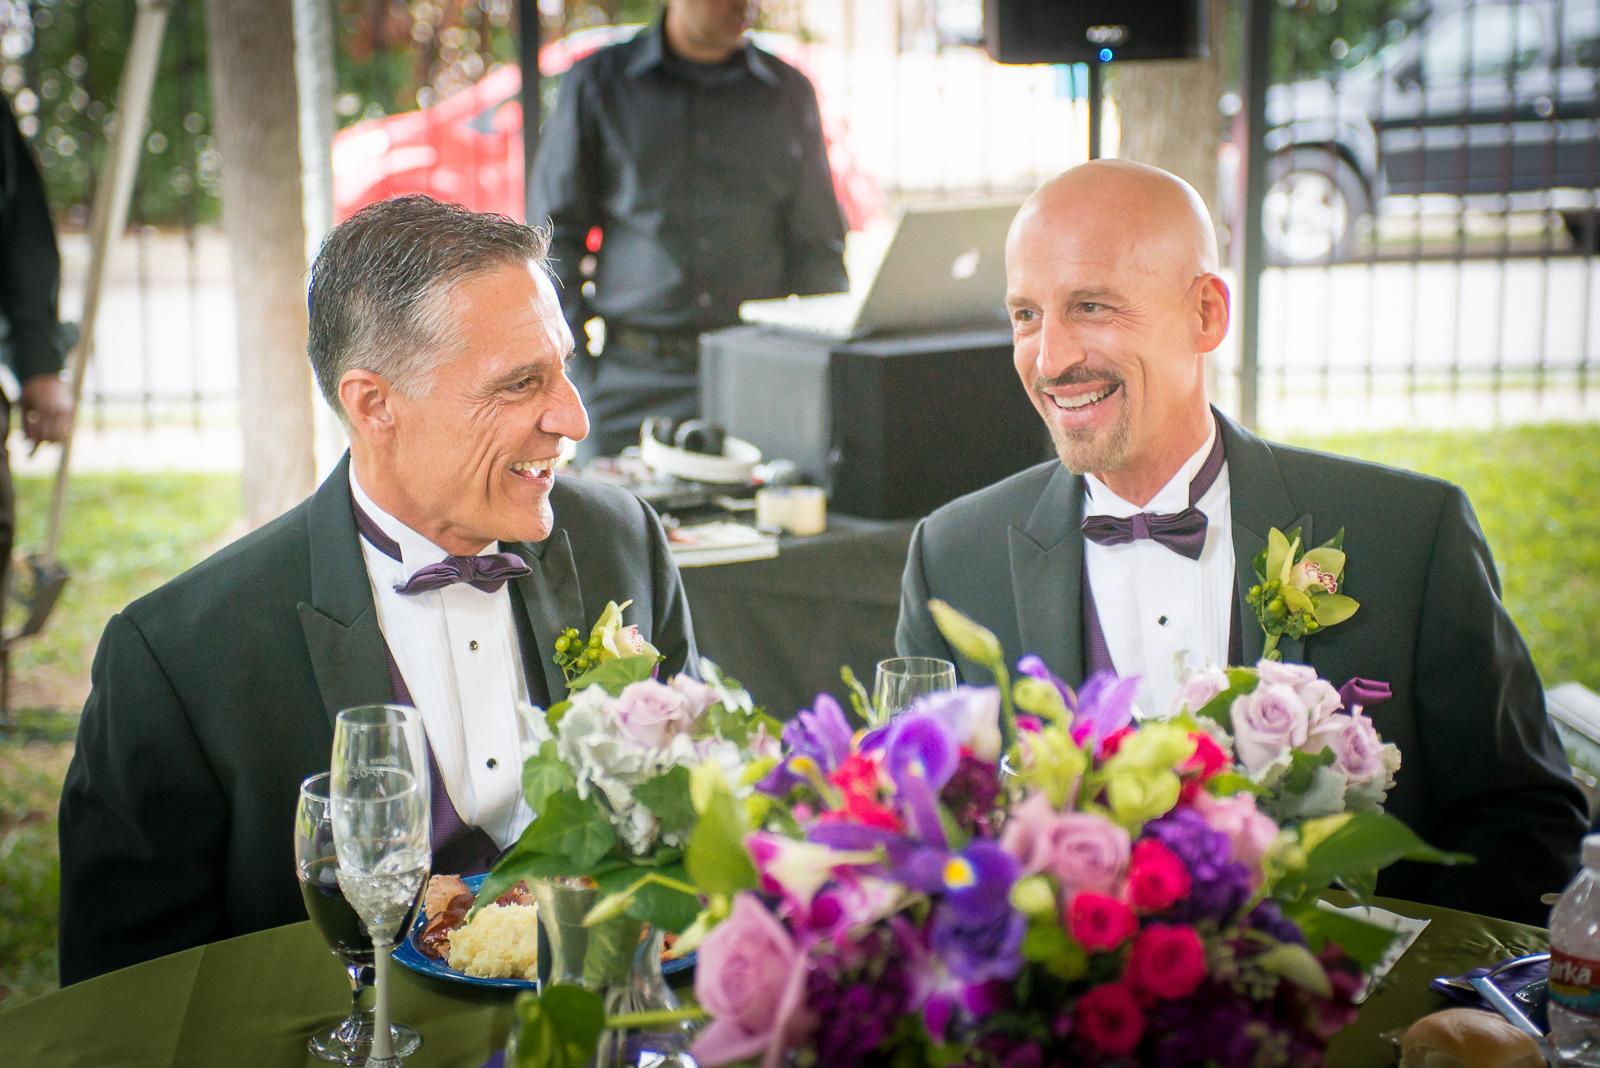 Michael-Napier-Weddings-Ludwig-Guilbeau Wedding-20 (28).jpg